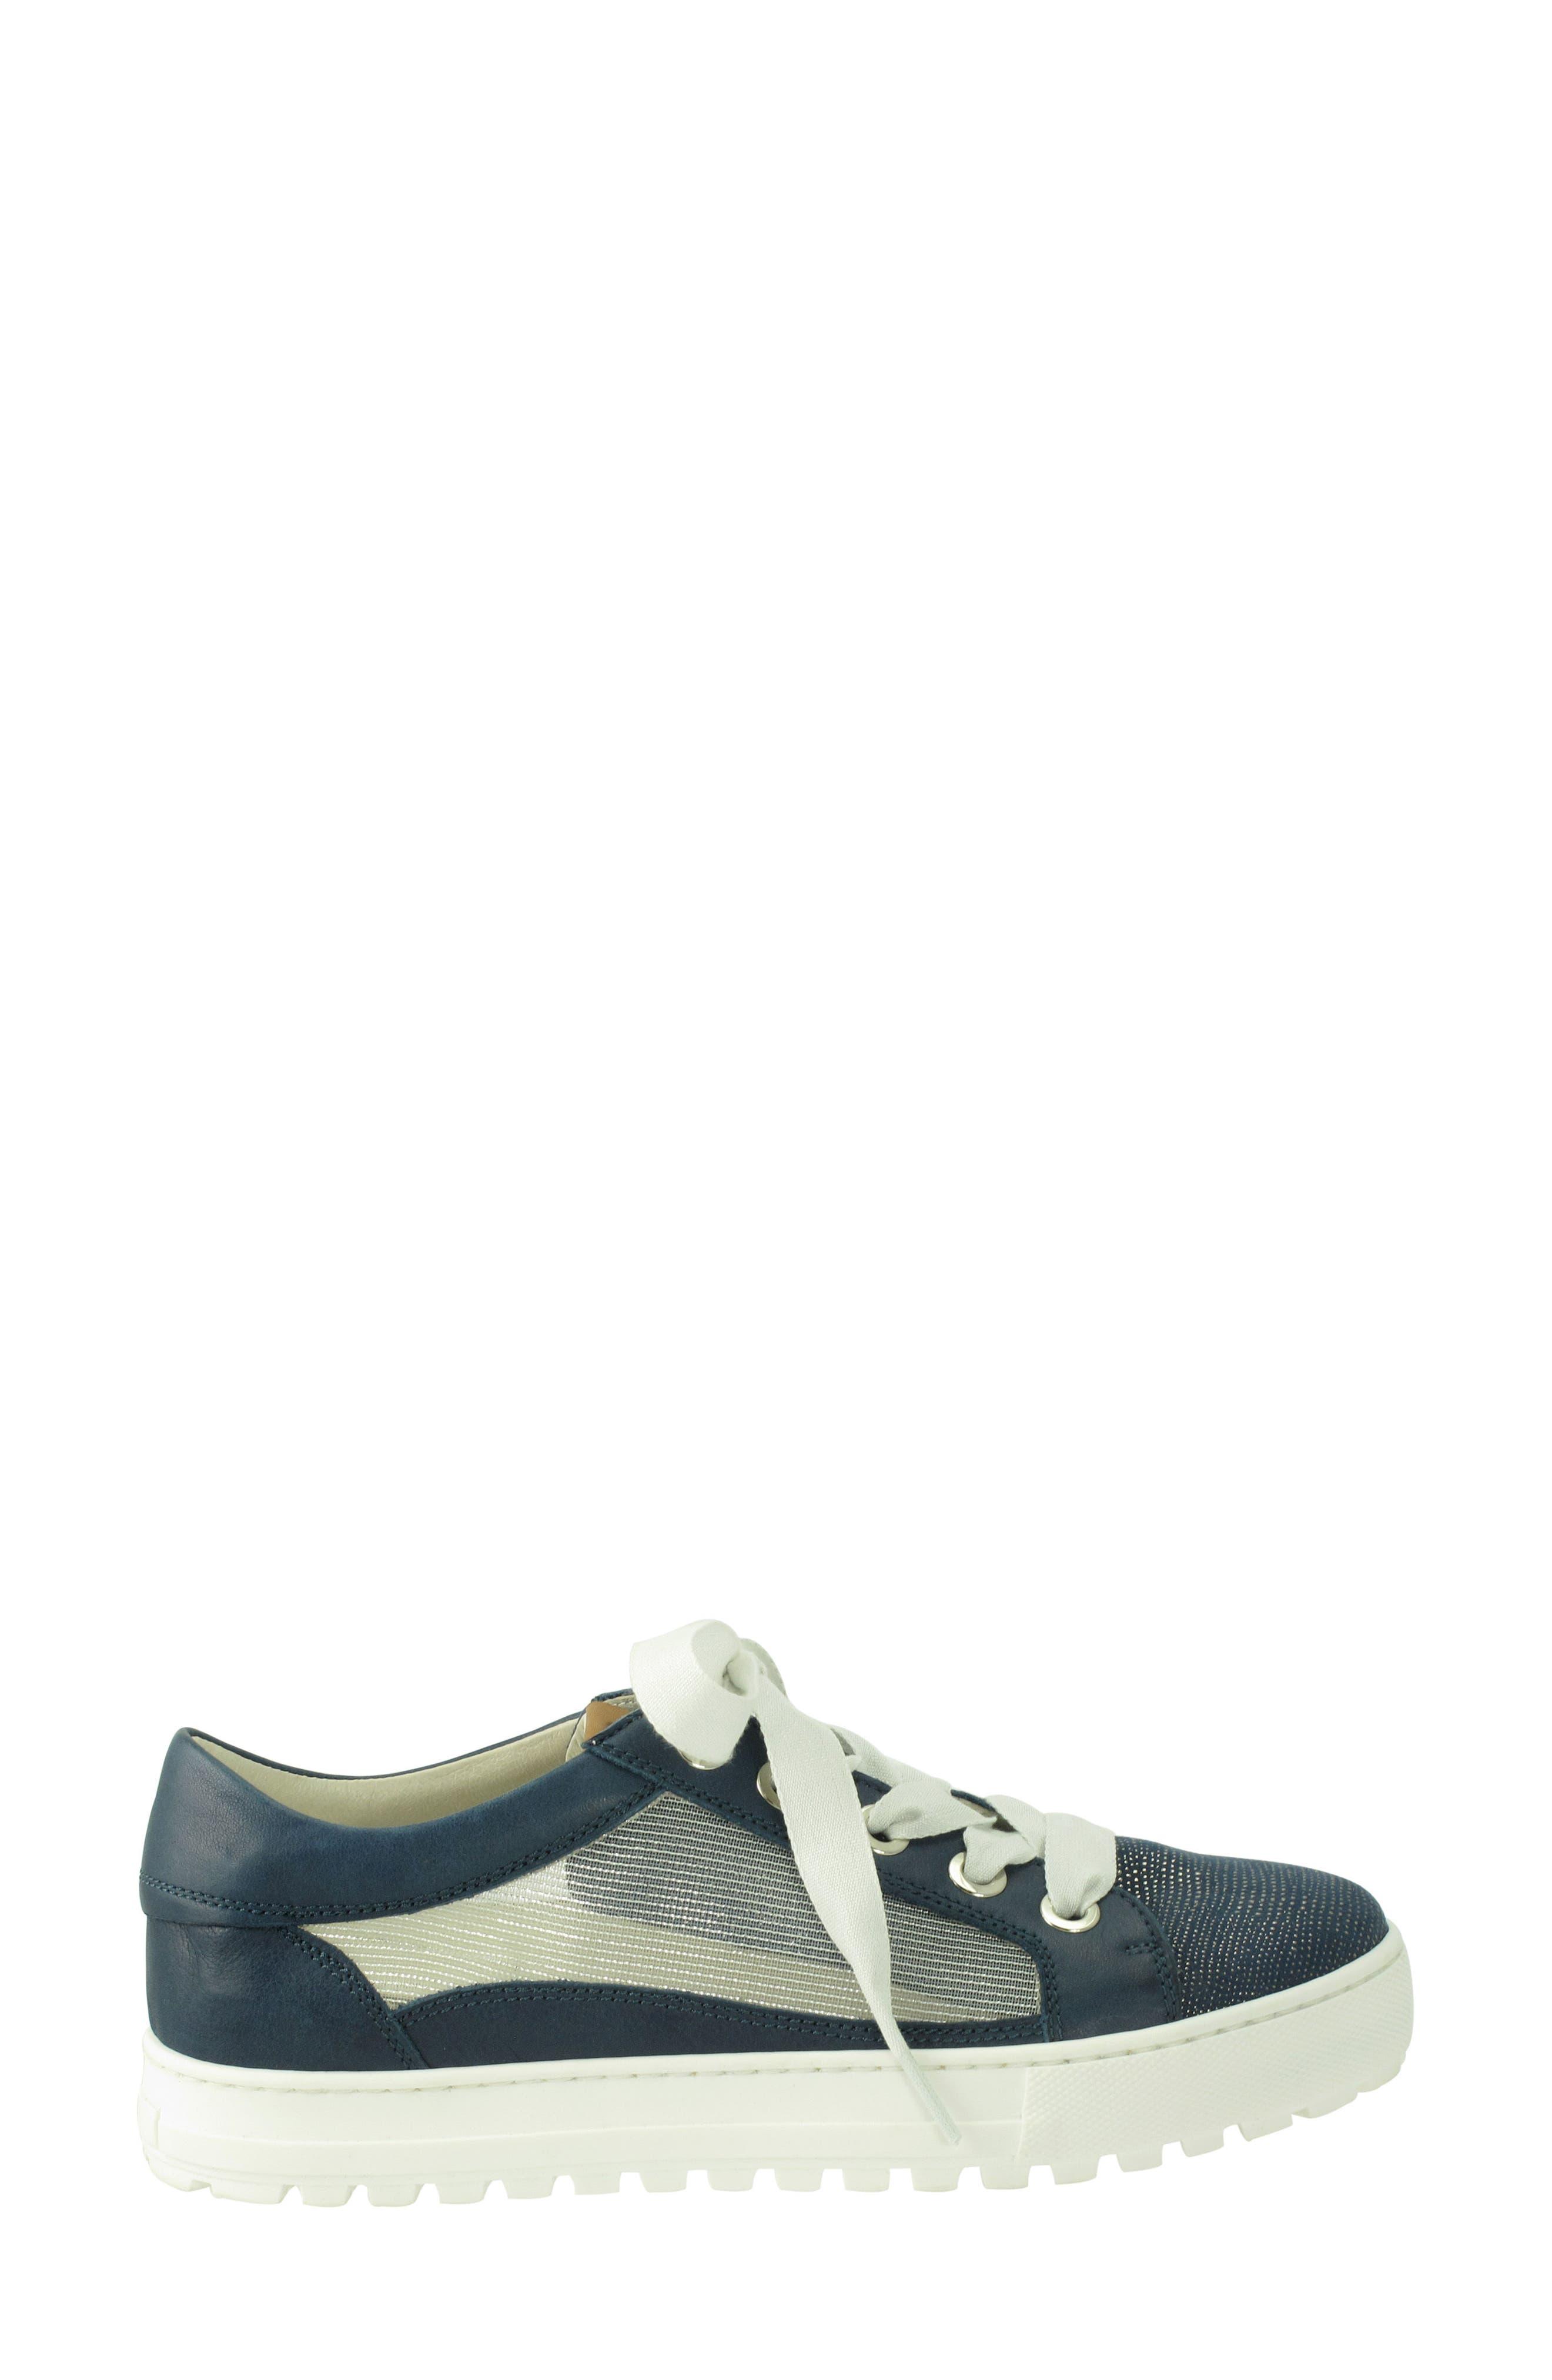 Layton Sneaker,                             Alternate thumbnail 3, color,                             Jeans Leather